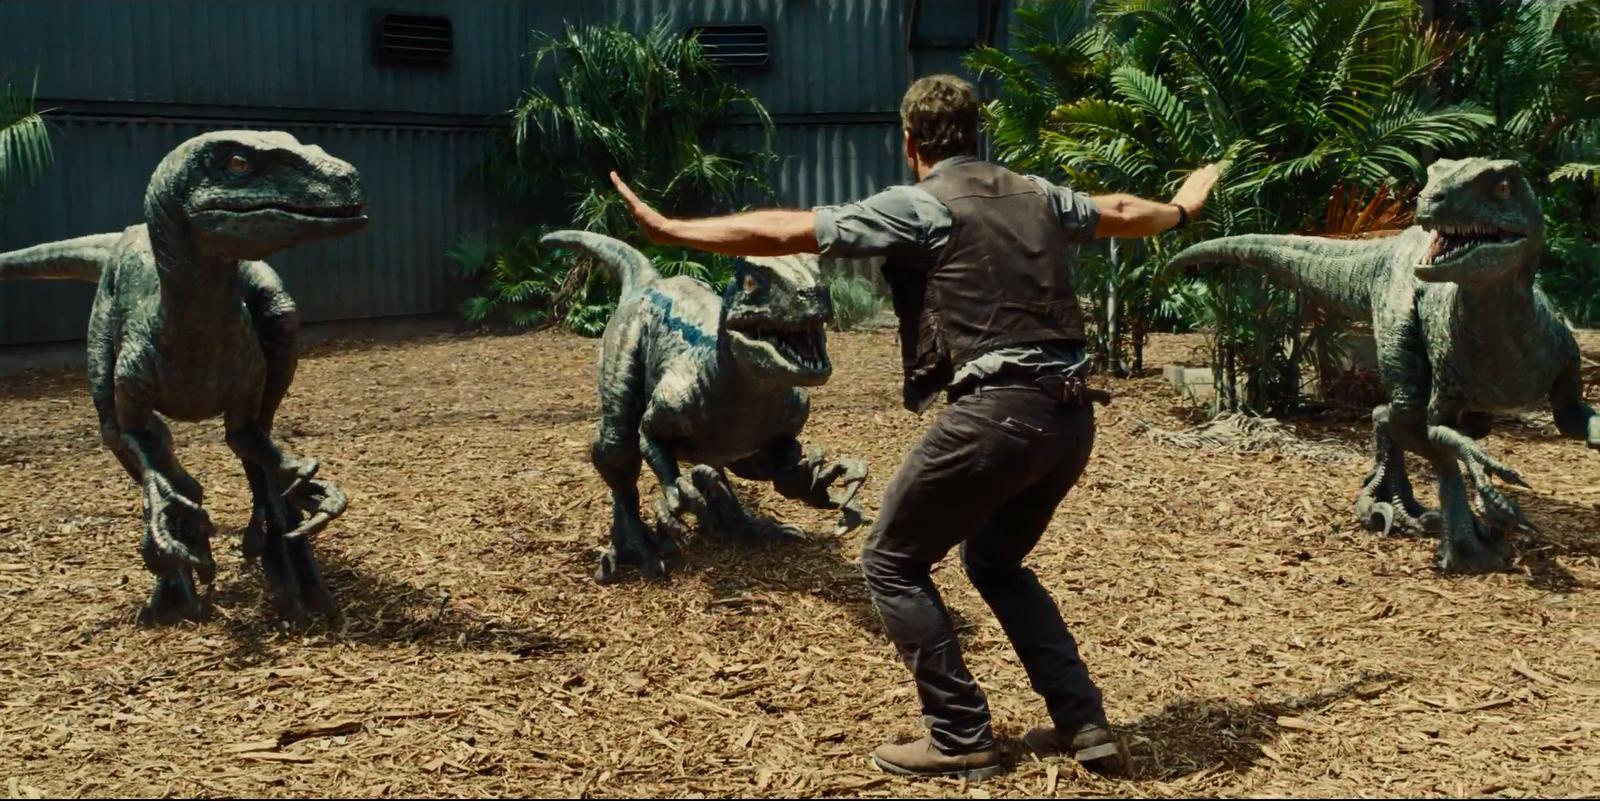 Pratt trains a bunch of Raptors in  Jurassic World